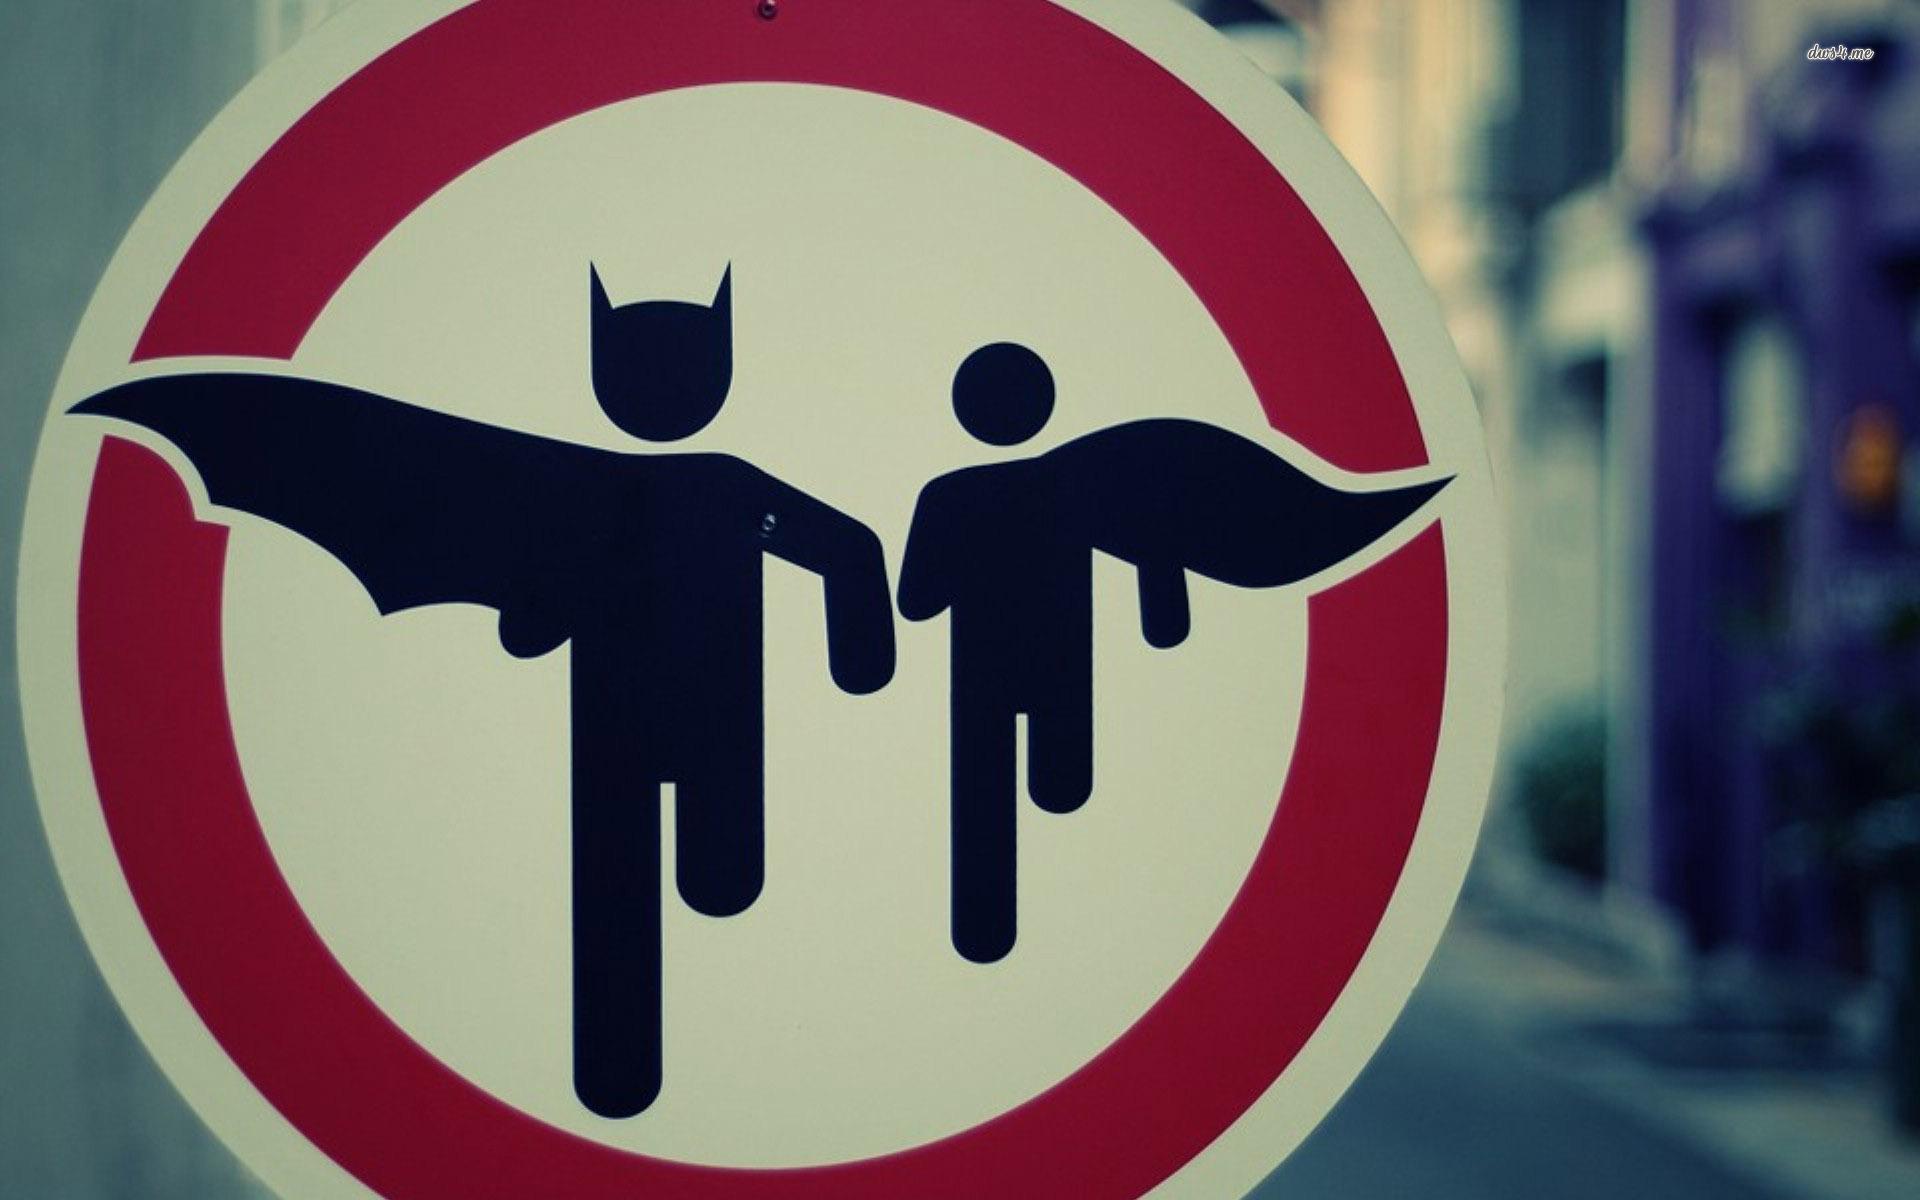 Batman And Robin Logo Wallpaper Batman and robin 1920x1200